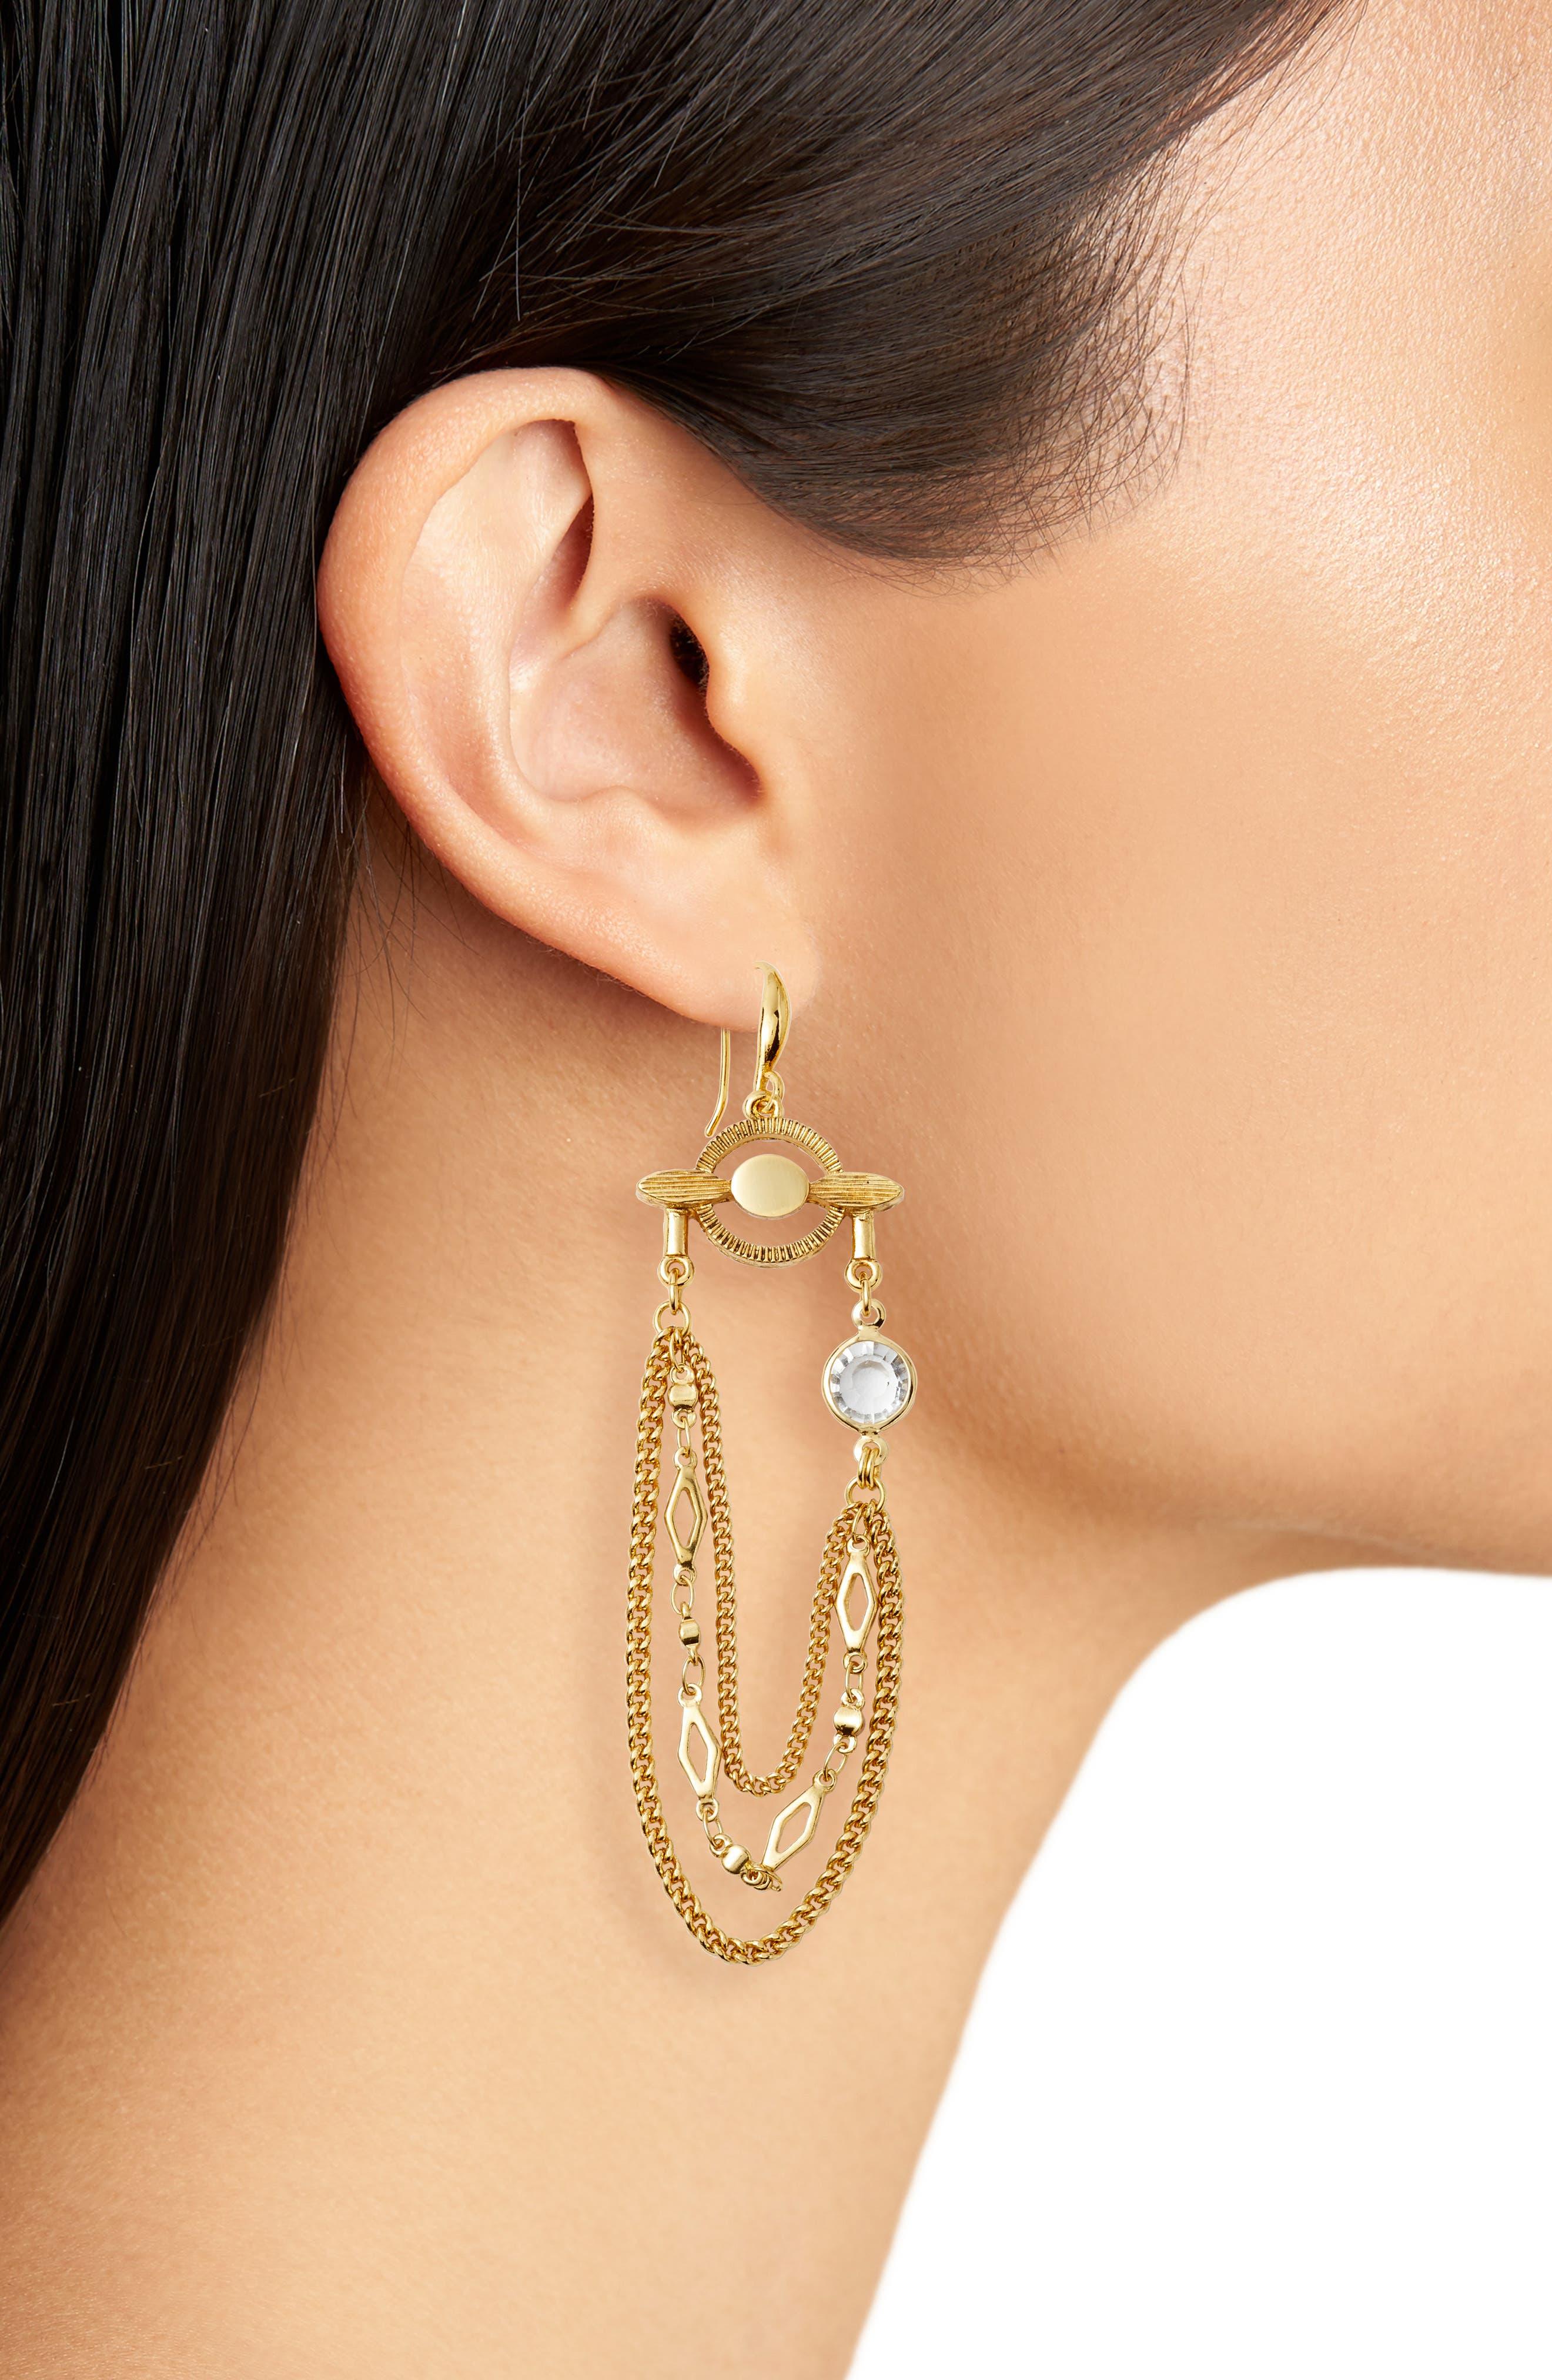 Badgley Mischka Asymmetrical Drop Earrings,                             Alternate thumbnail 2, color,                             710